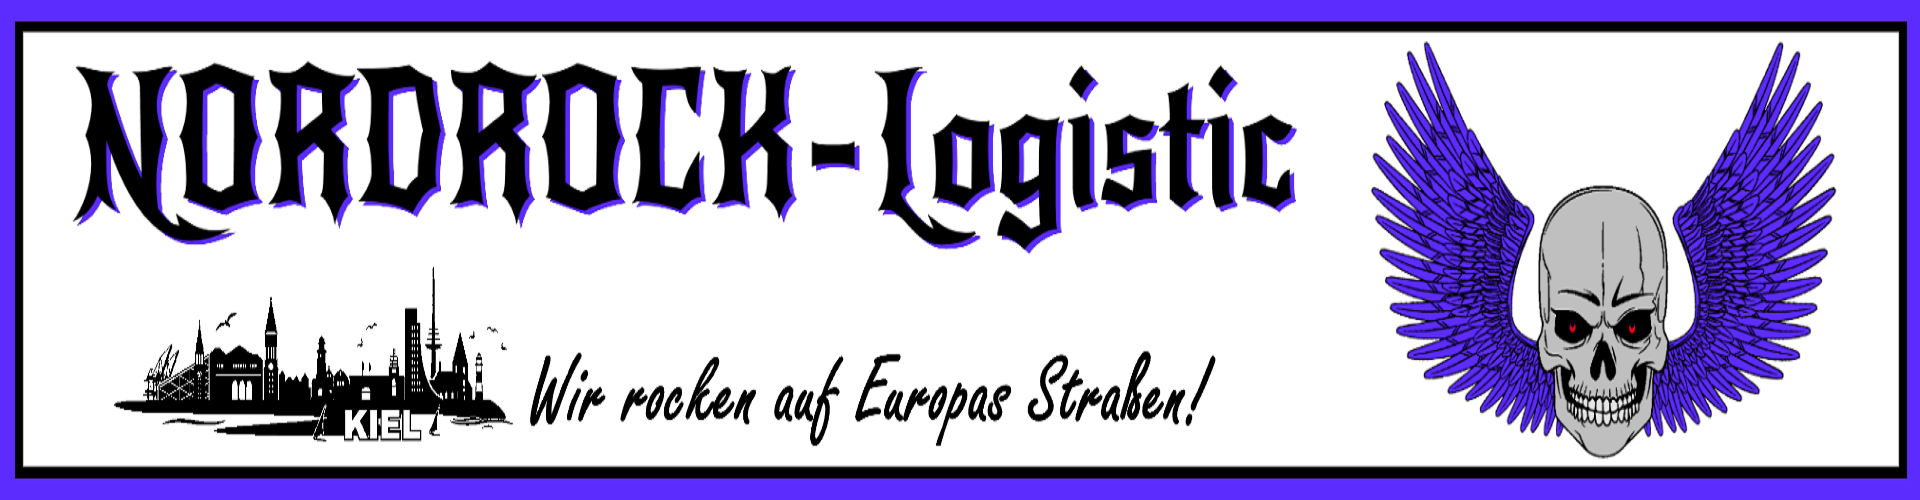 Nordrock-Logistic